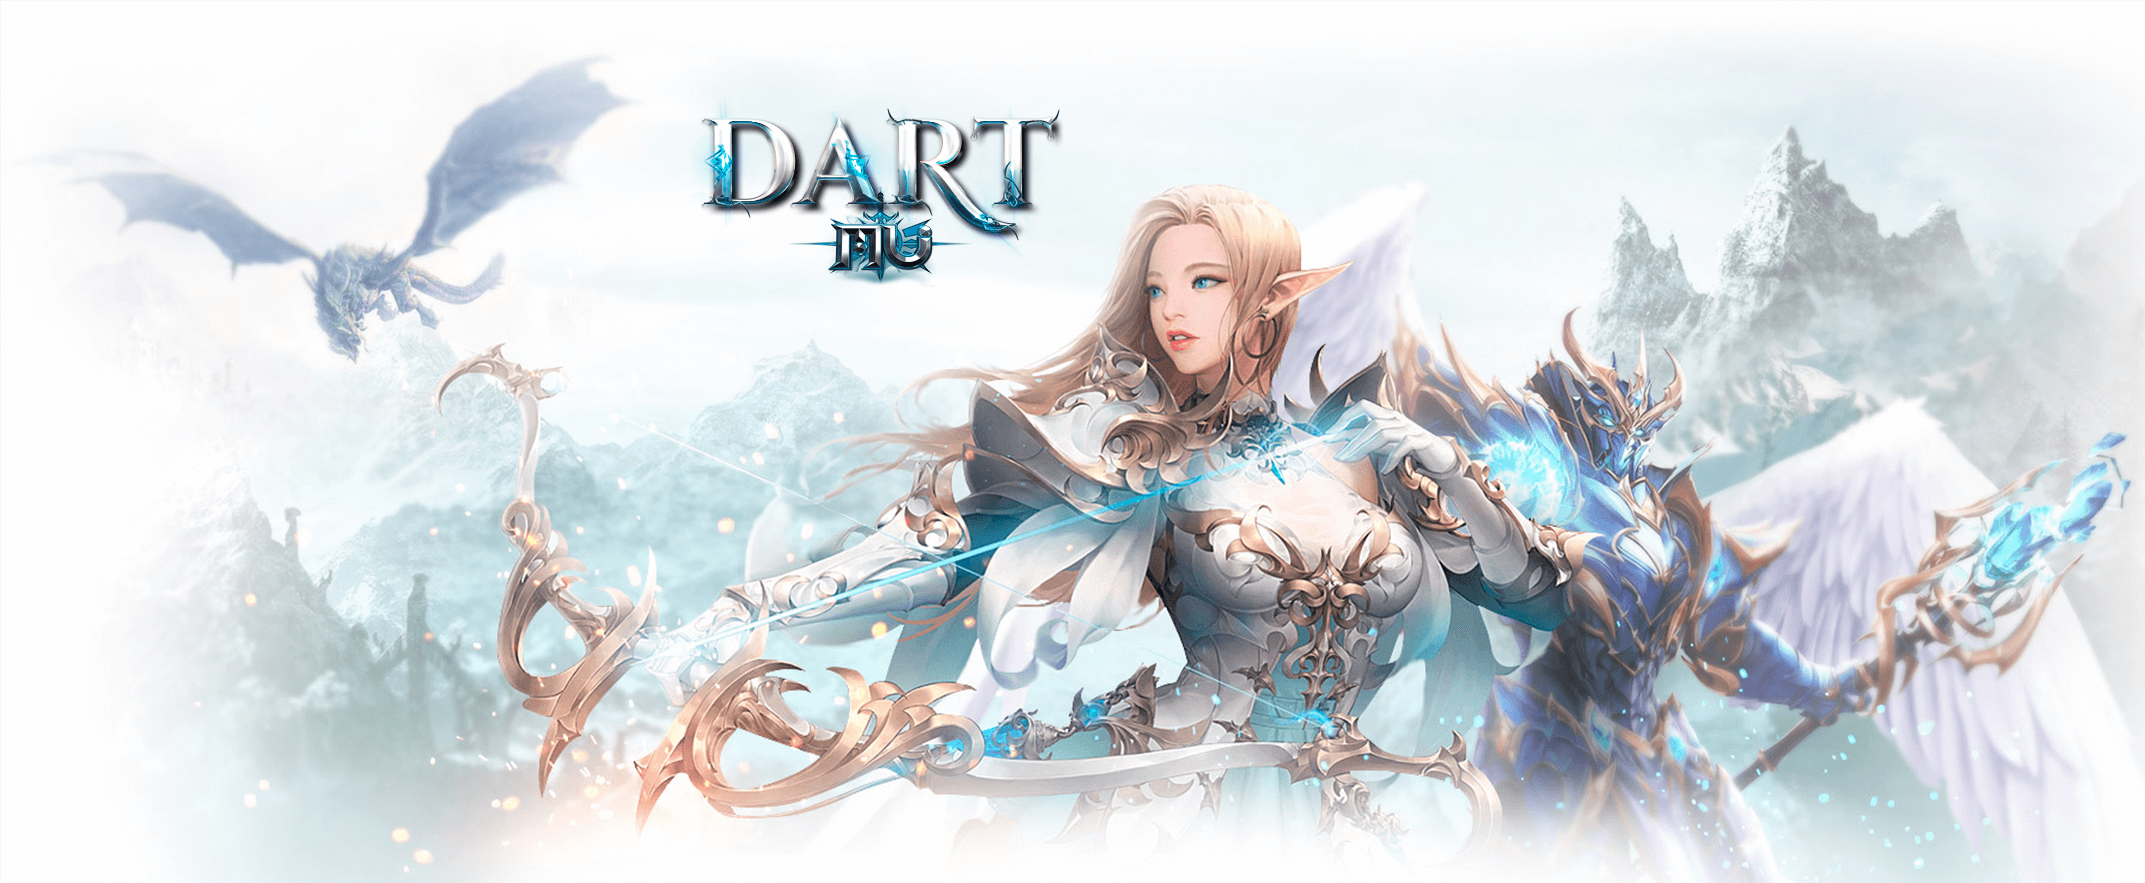 Dart Mu S15 | X15 Noreset | Premium Anticheat | New Jewels, Quests | Launch [06/01/2021] - JANUARY 6 Fb-header